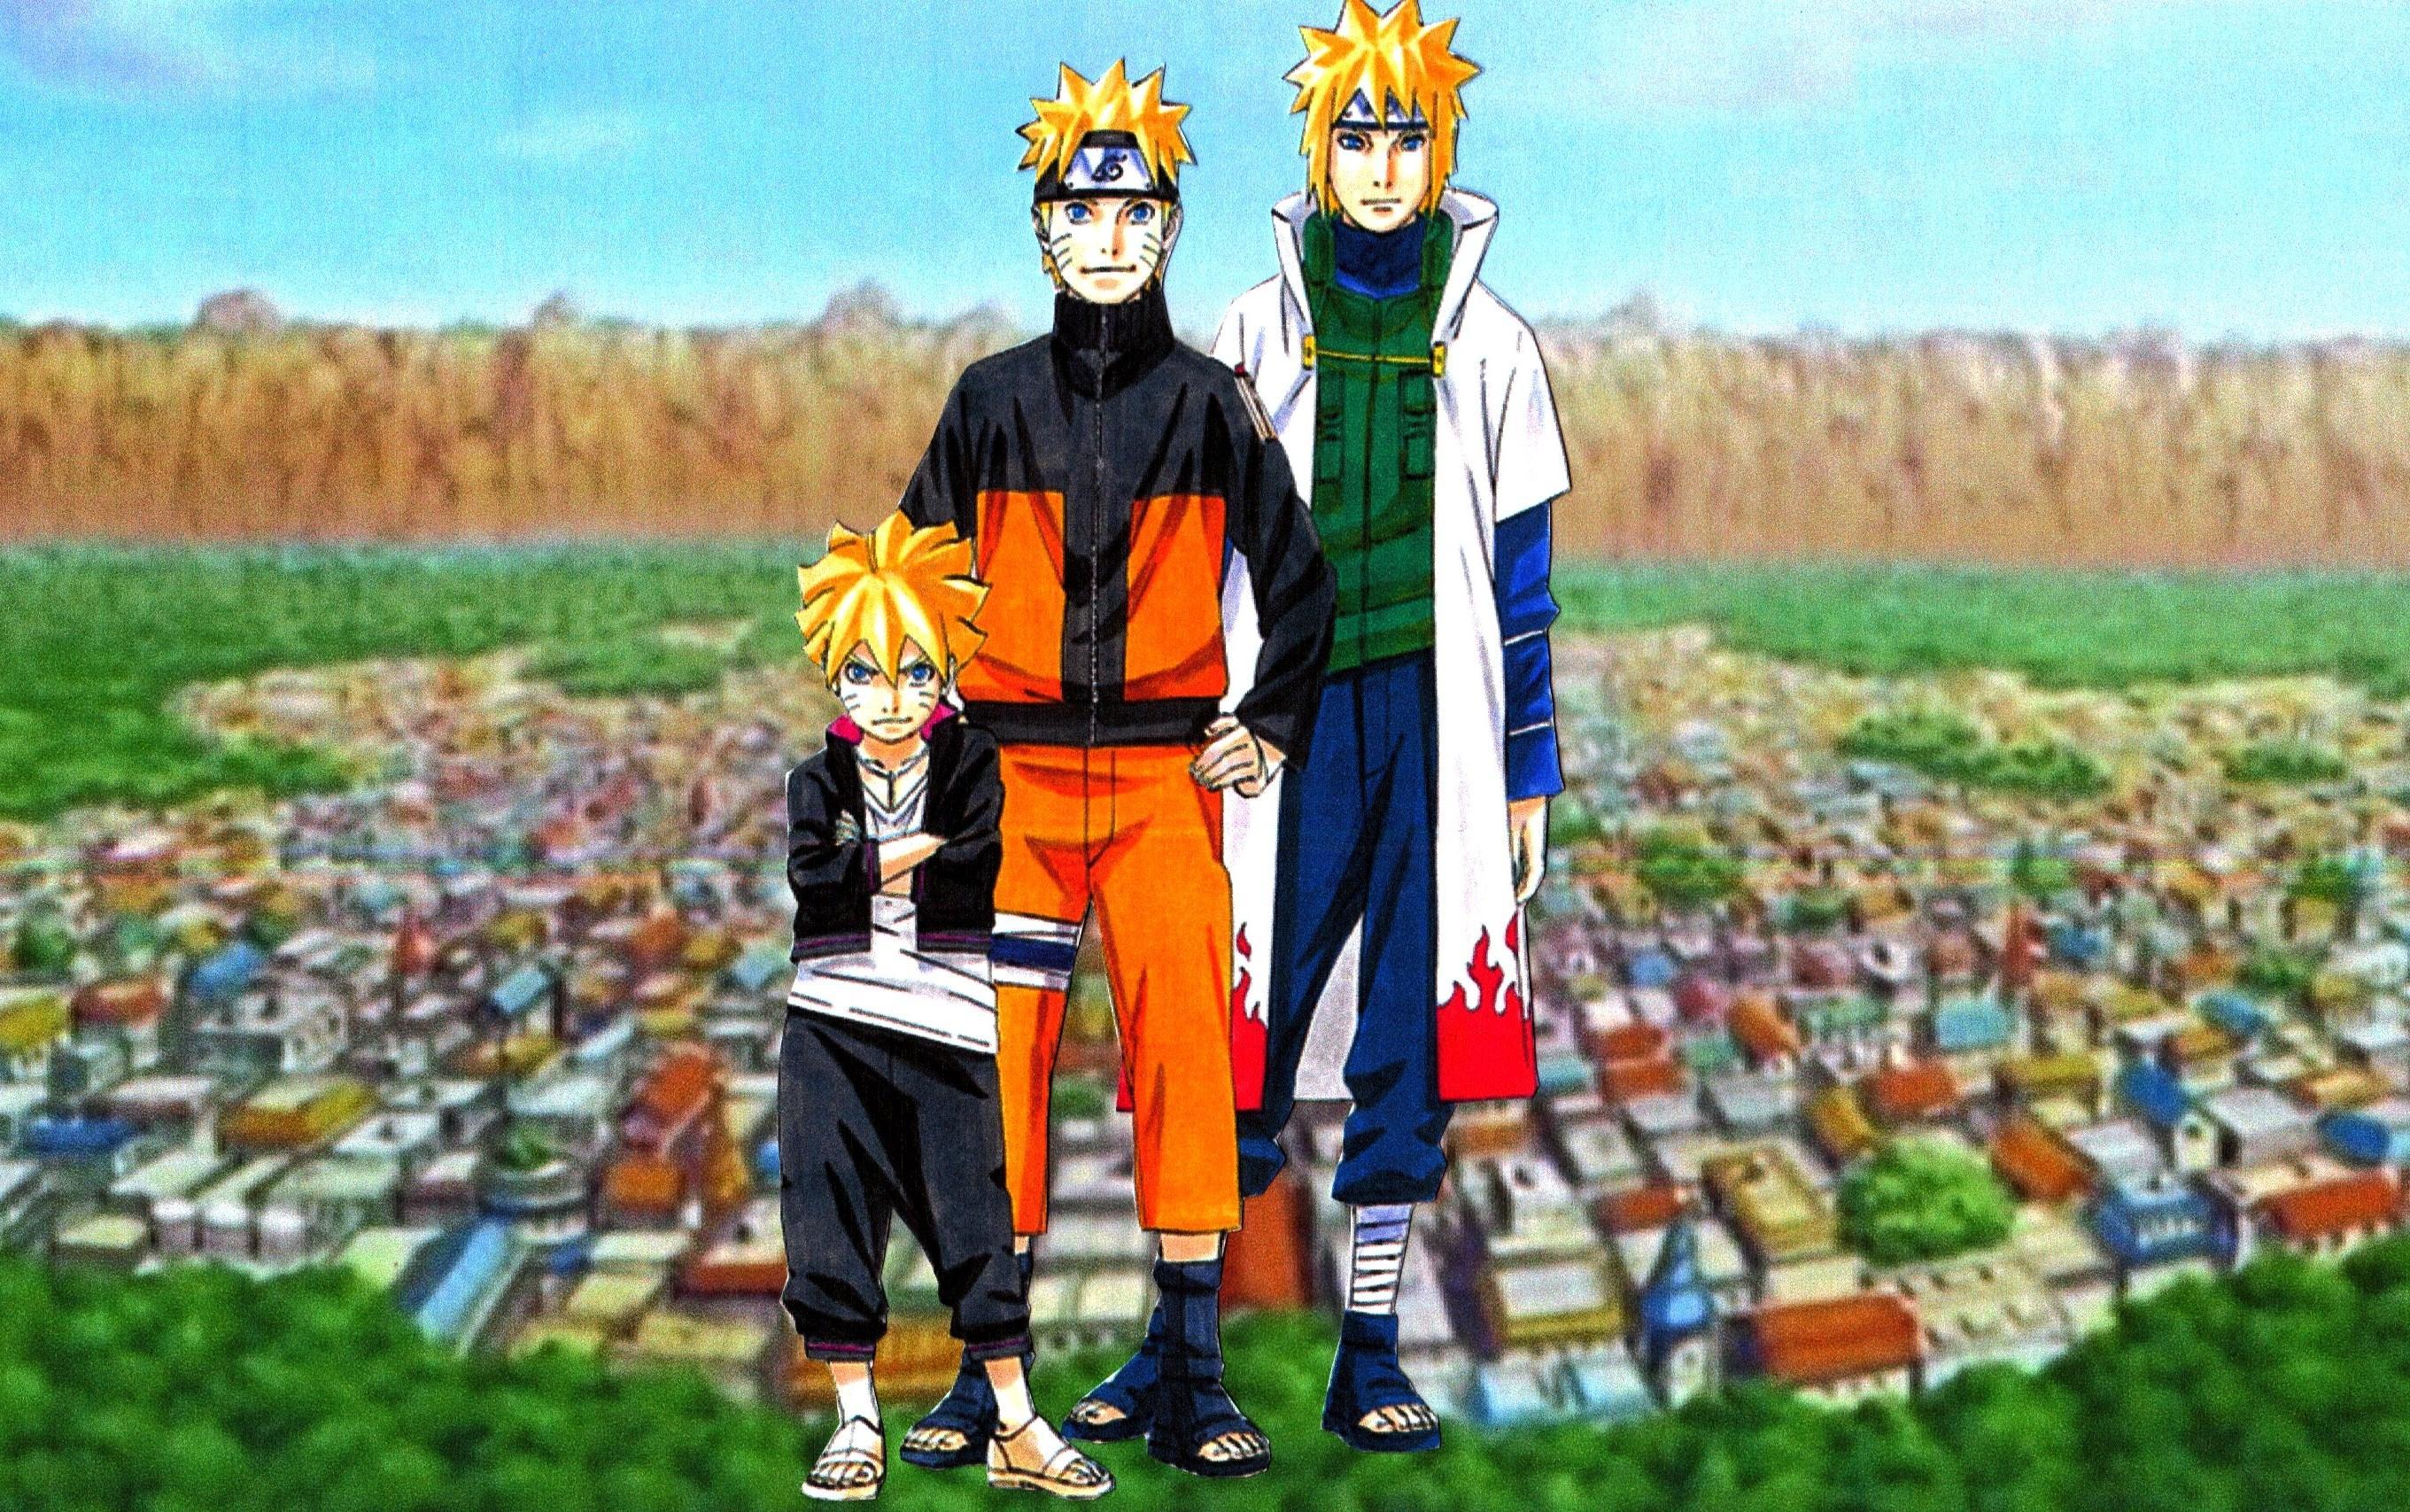 Minato Naruto Boruto Wallpaper 2 by weissdrum on DeviantArt